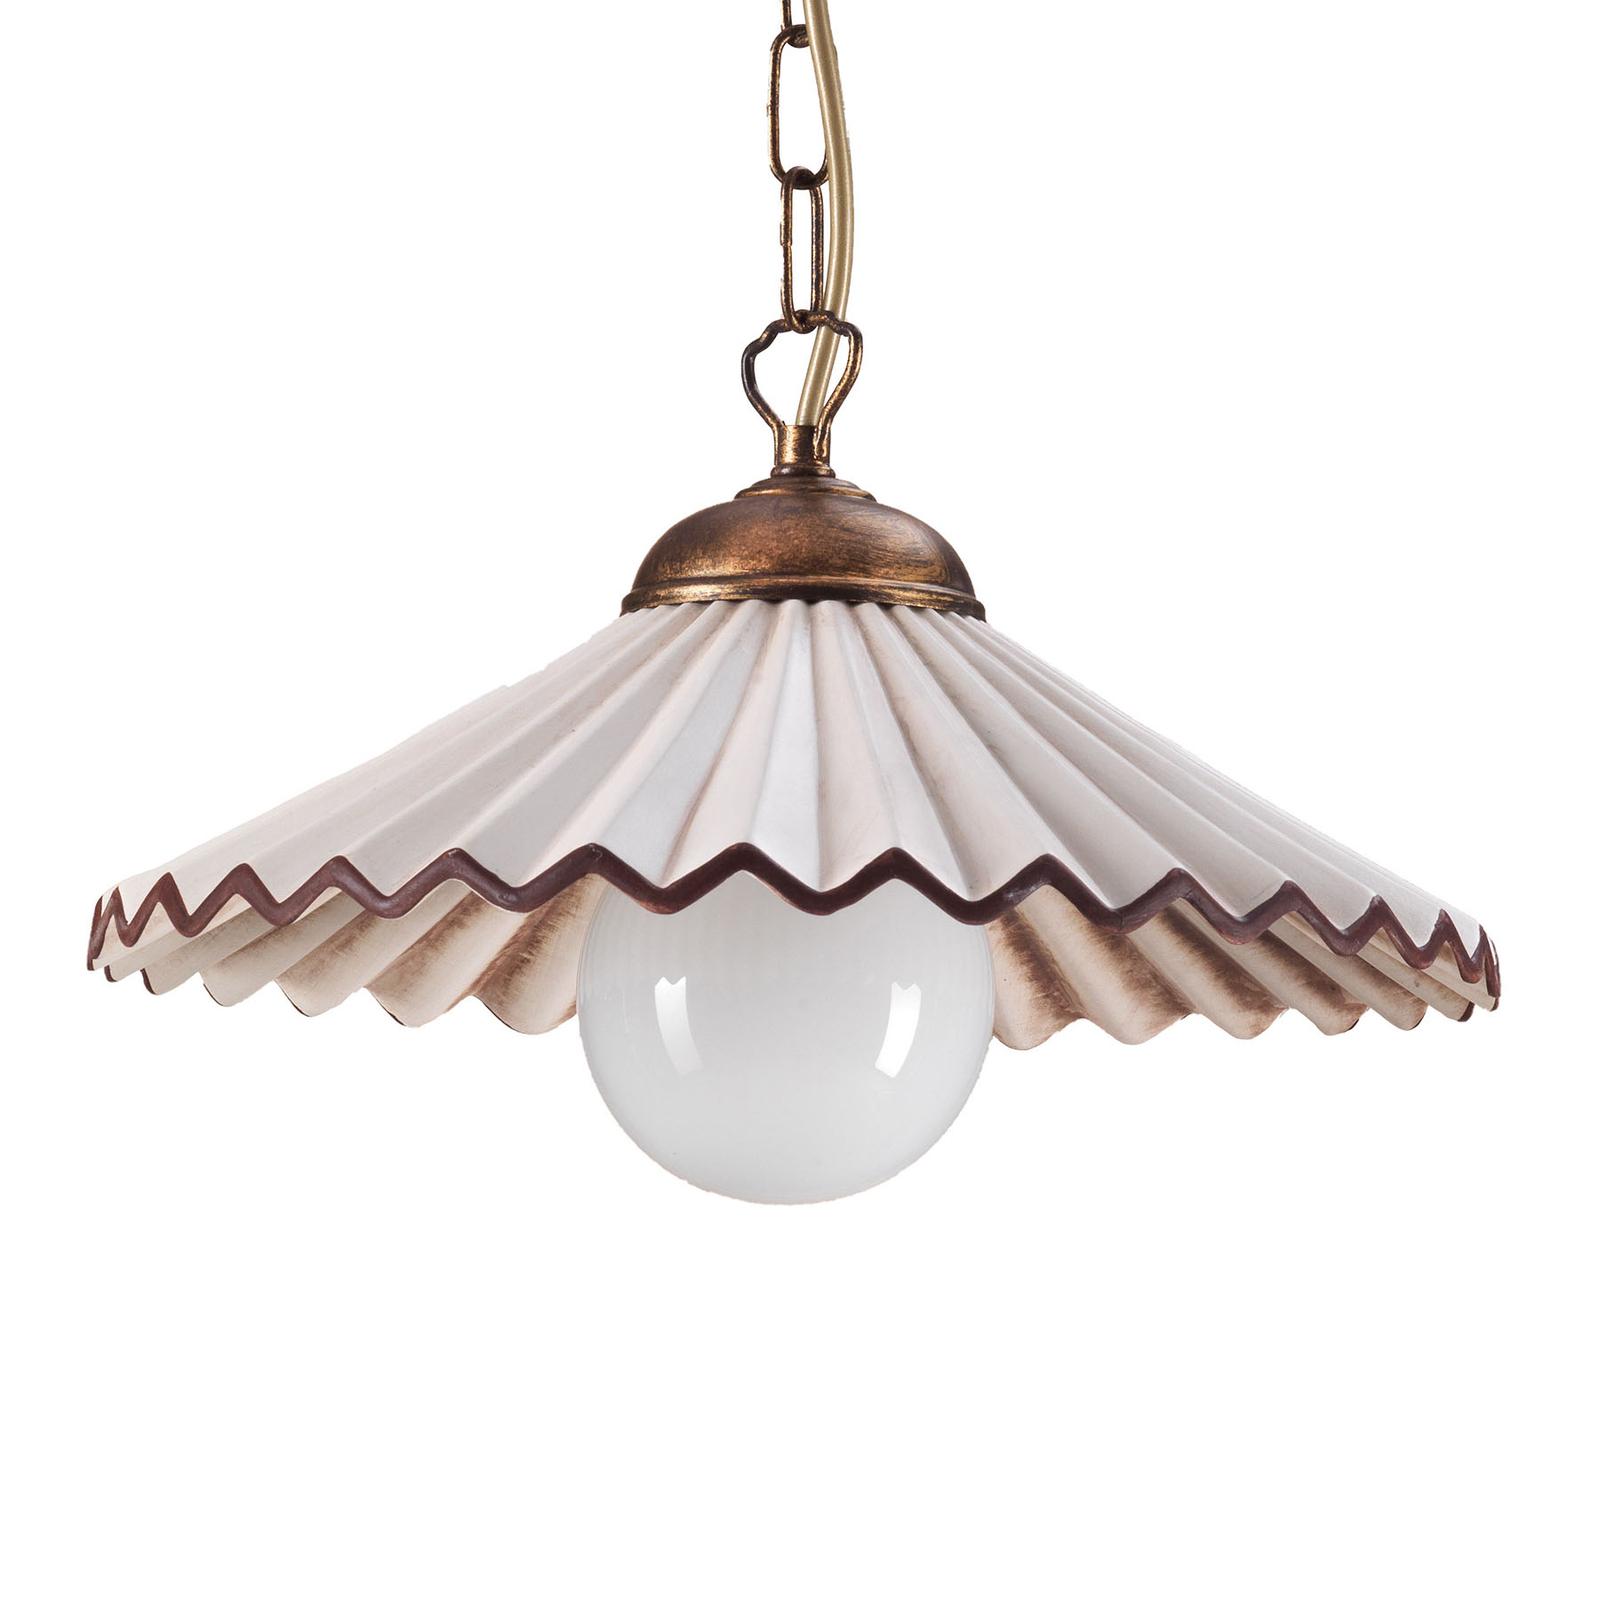 Suspension Rosina à 1 lampe rose clair/bronze